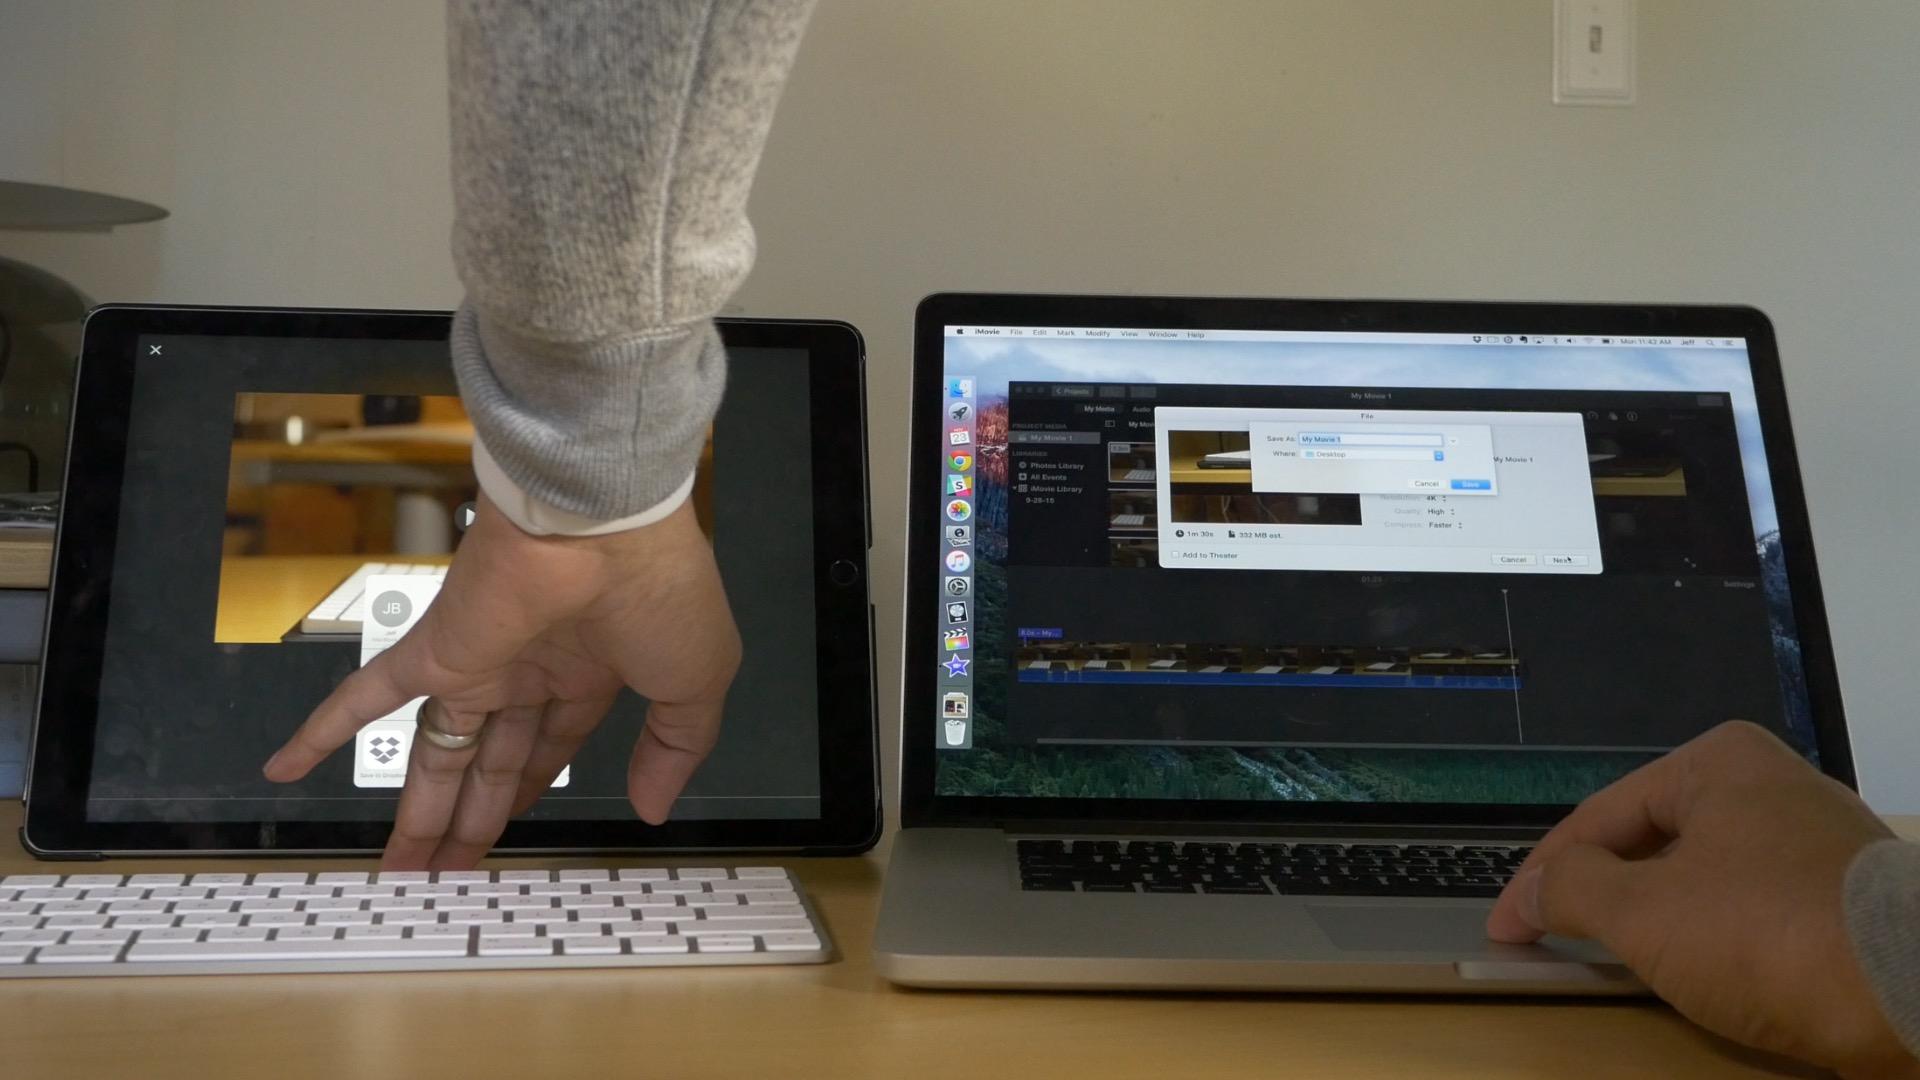 Macbook Pro vs iPad Pro